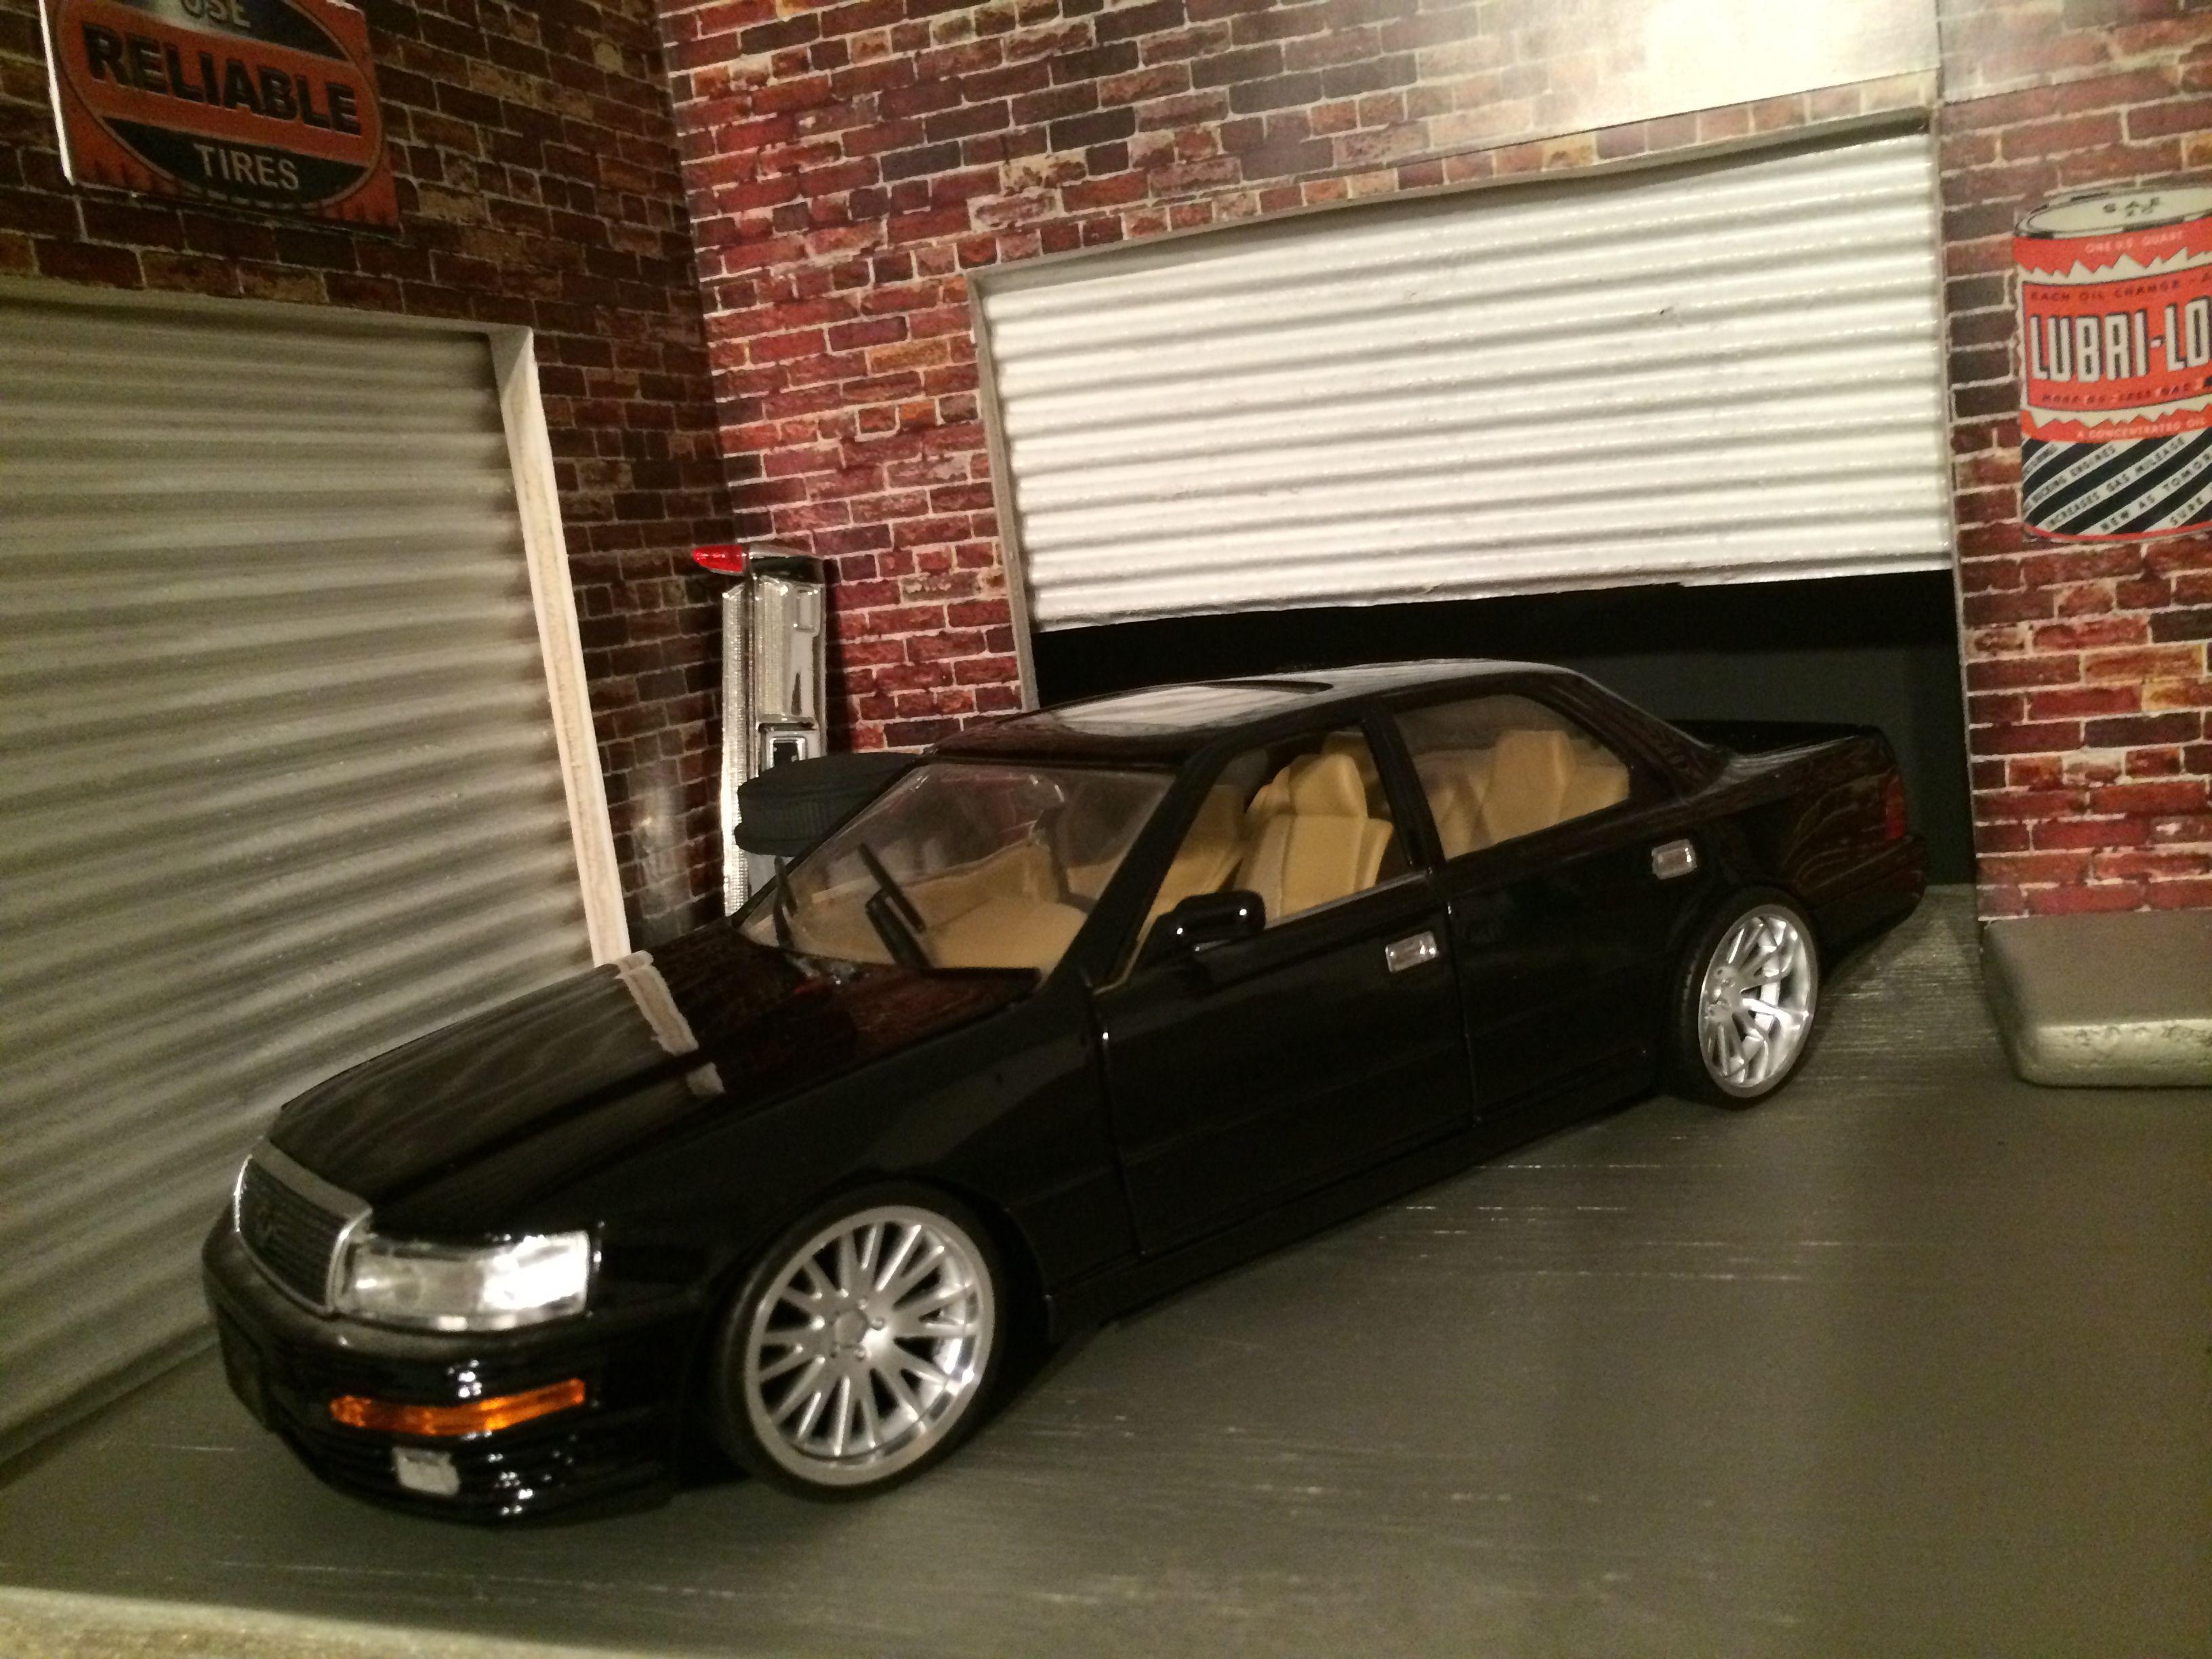 Lexus LS 400 Automobile Gallery Pinterest